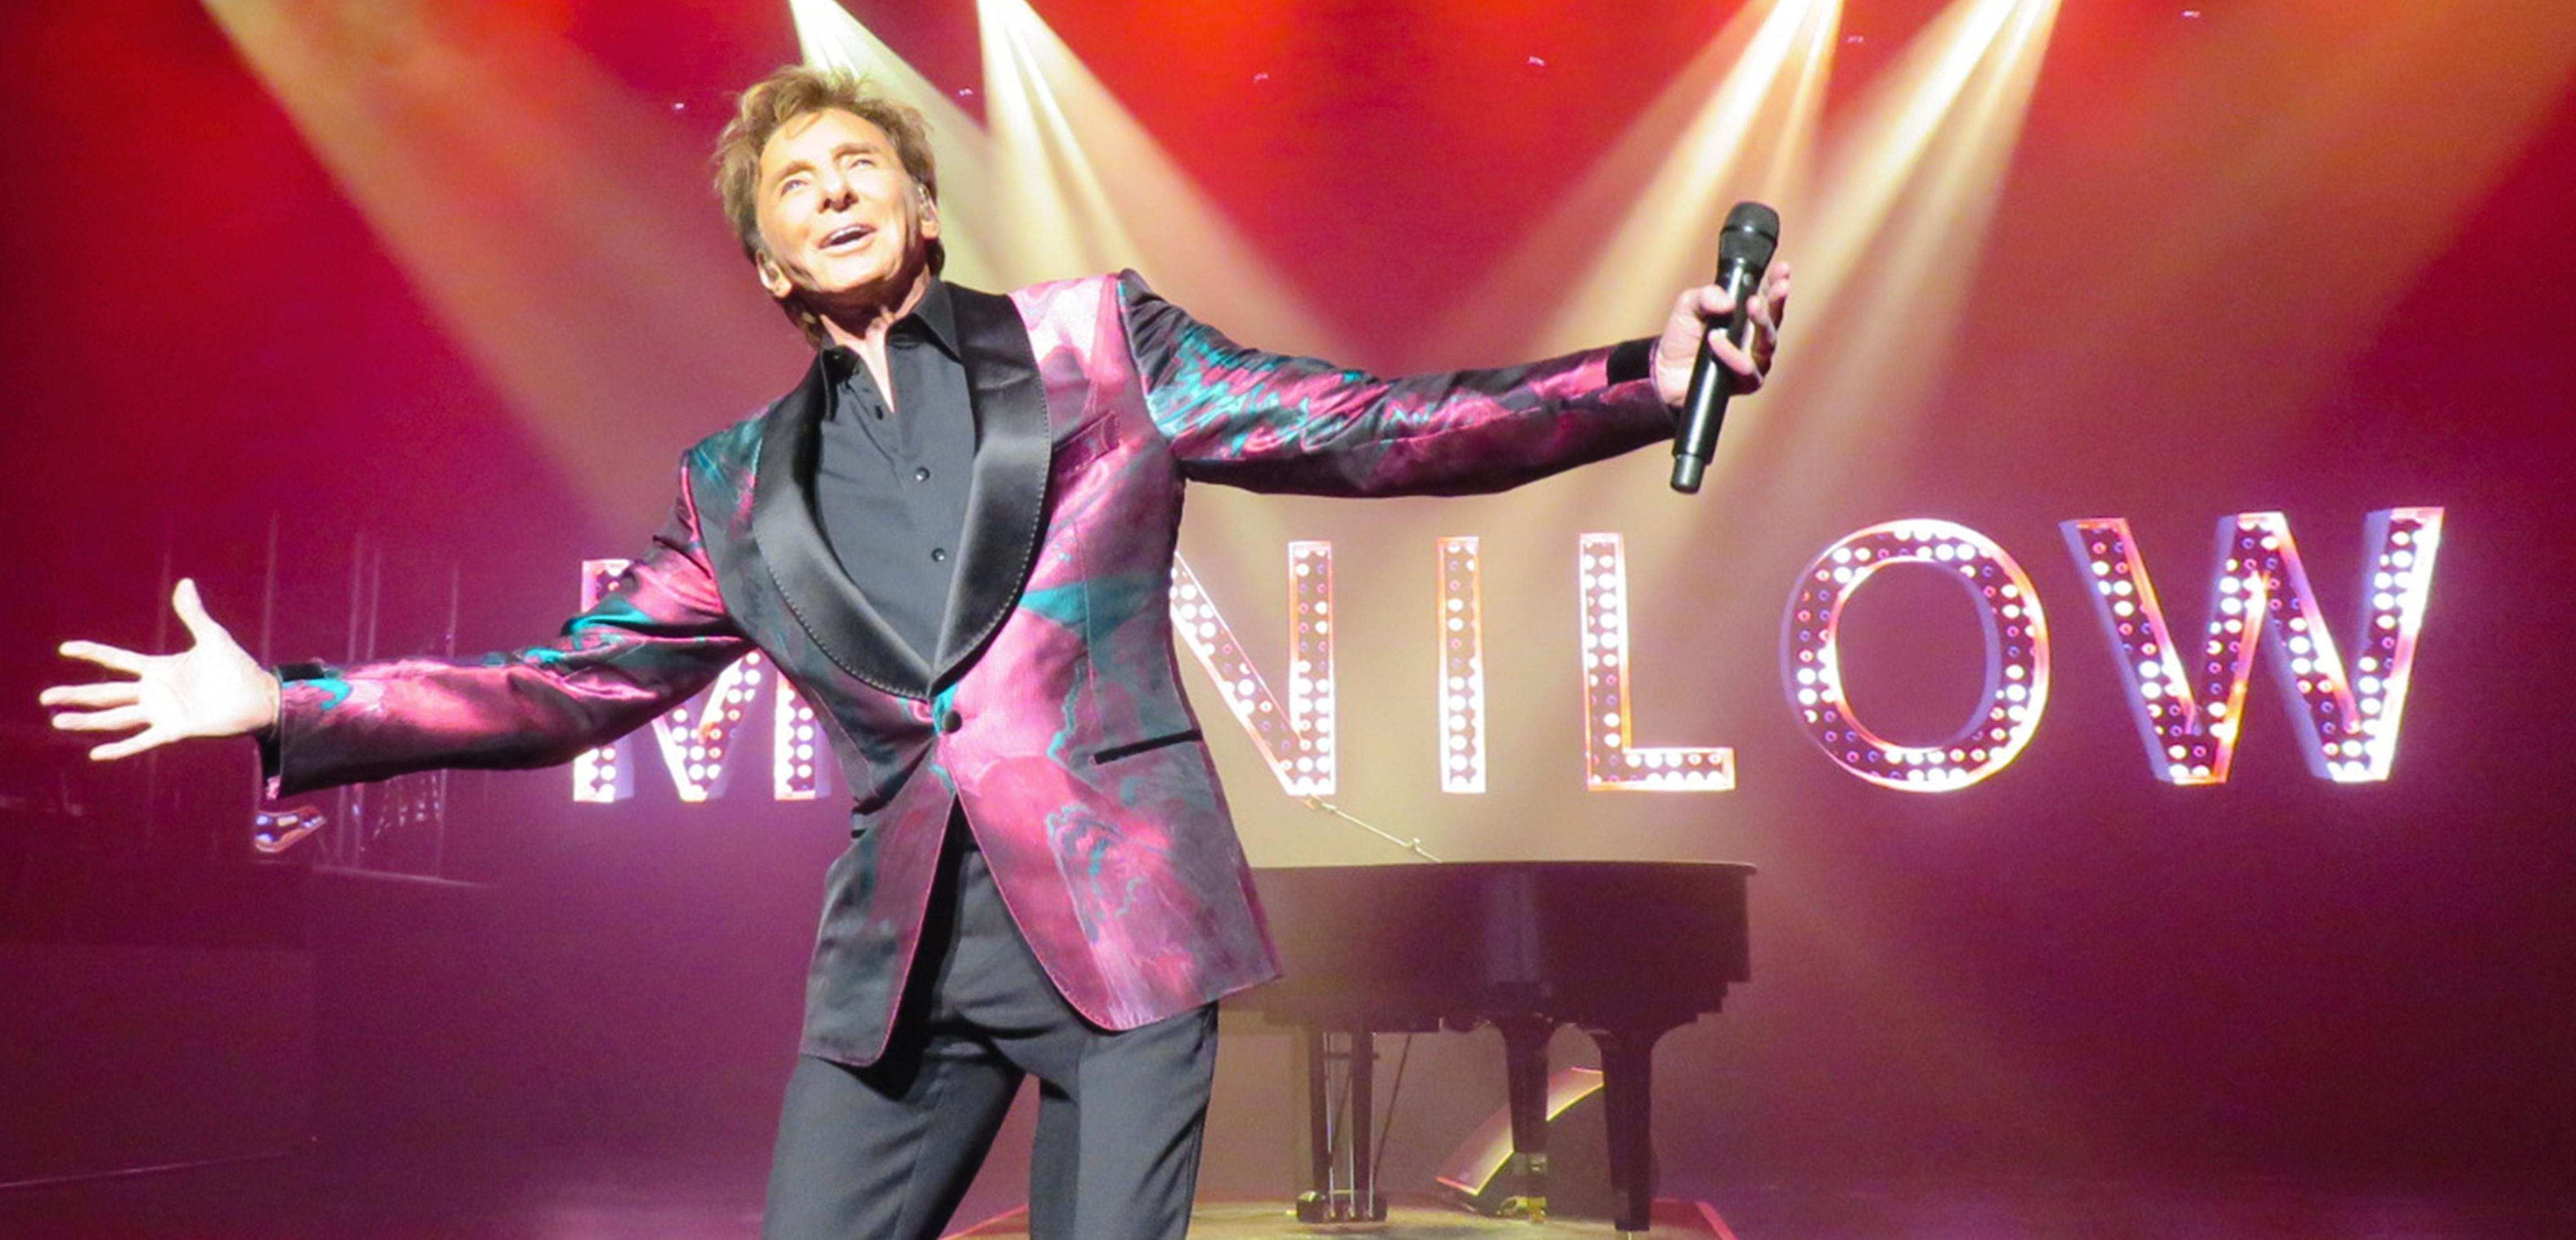 MANILOW: Las Vegas - September 26, 2019 - 26 SEP 2019